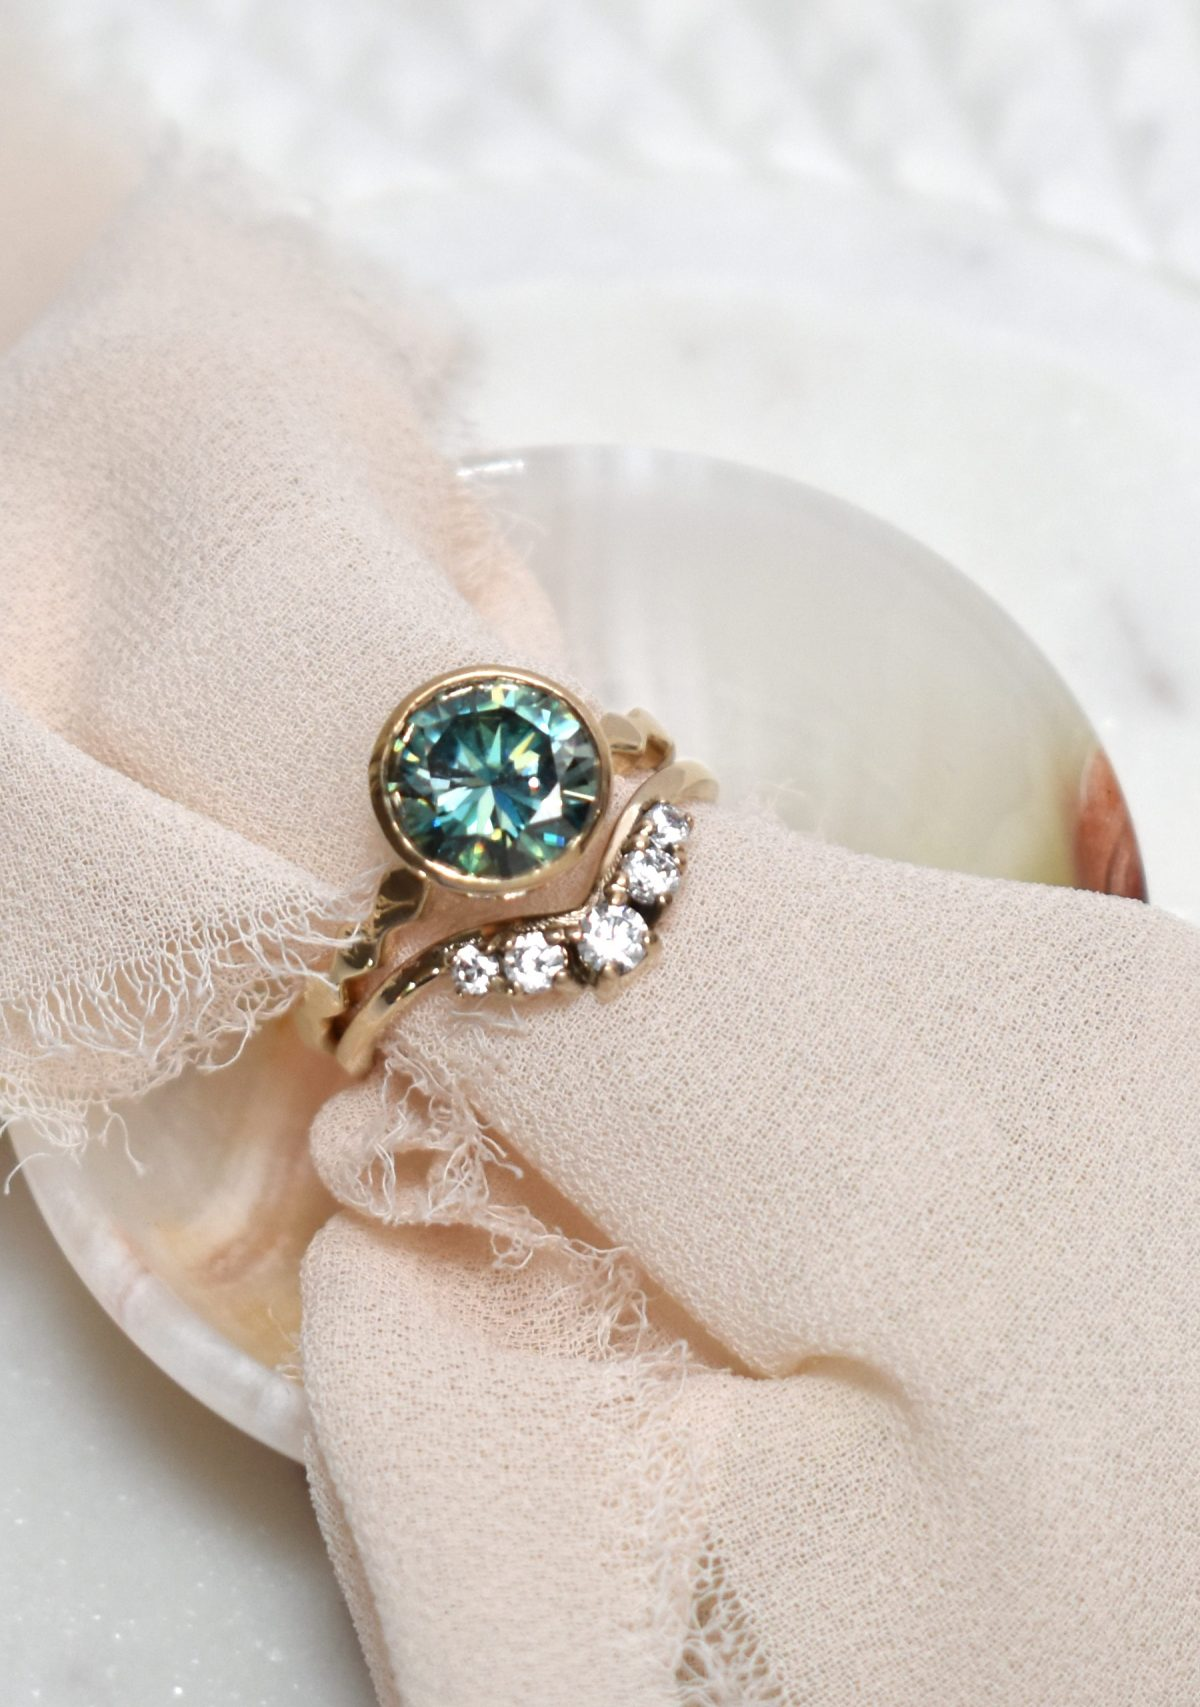 5-stone diamond wedding band gold